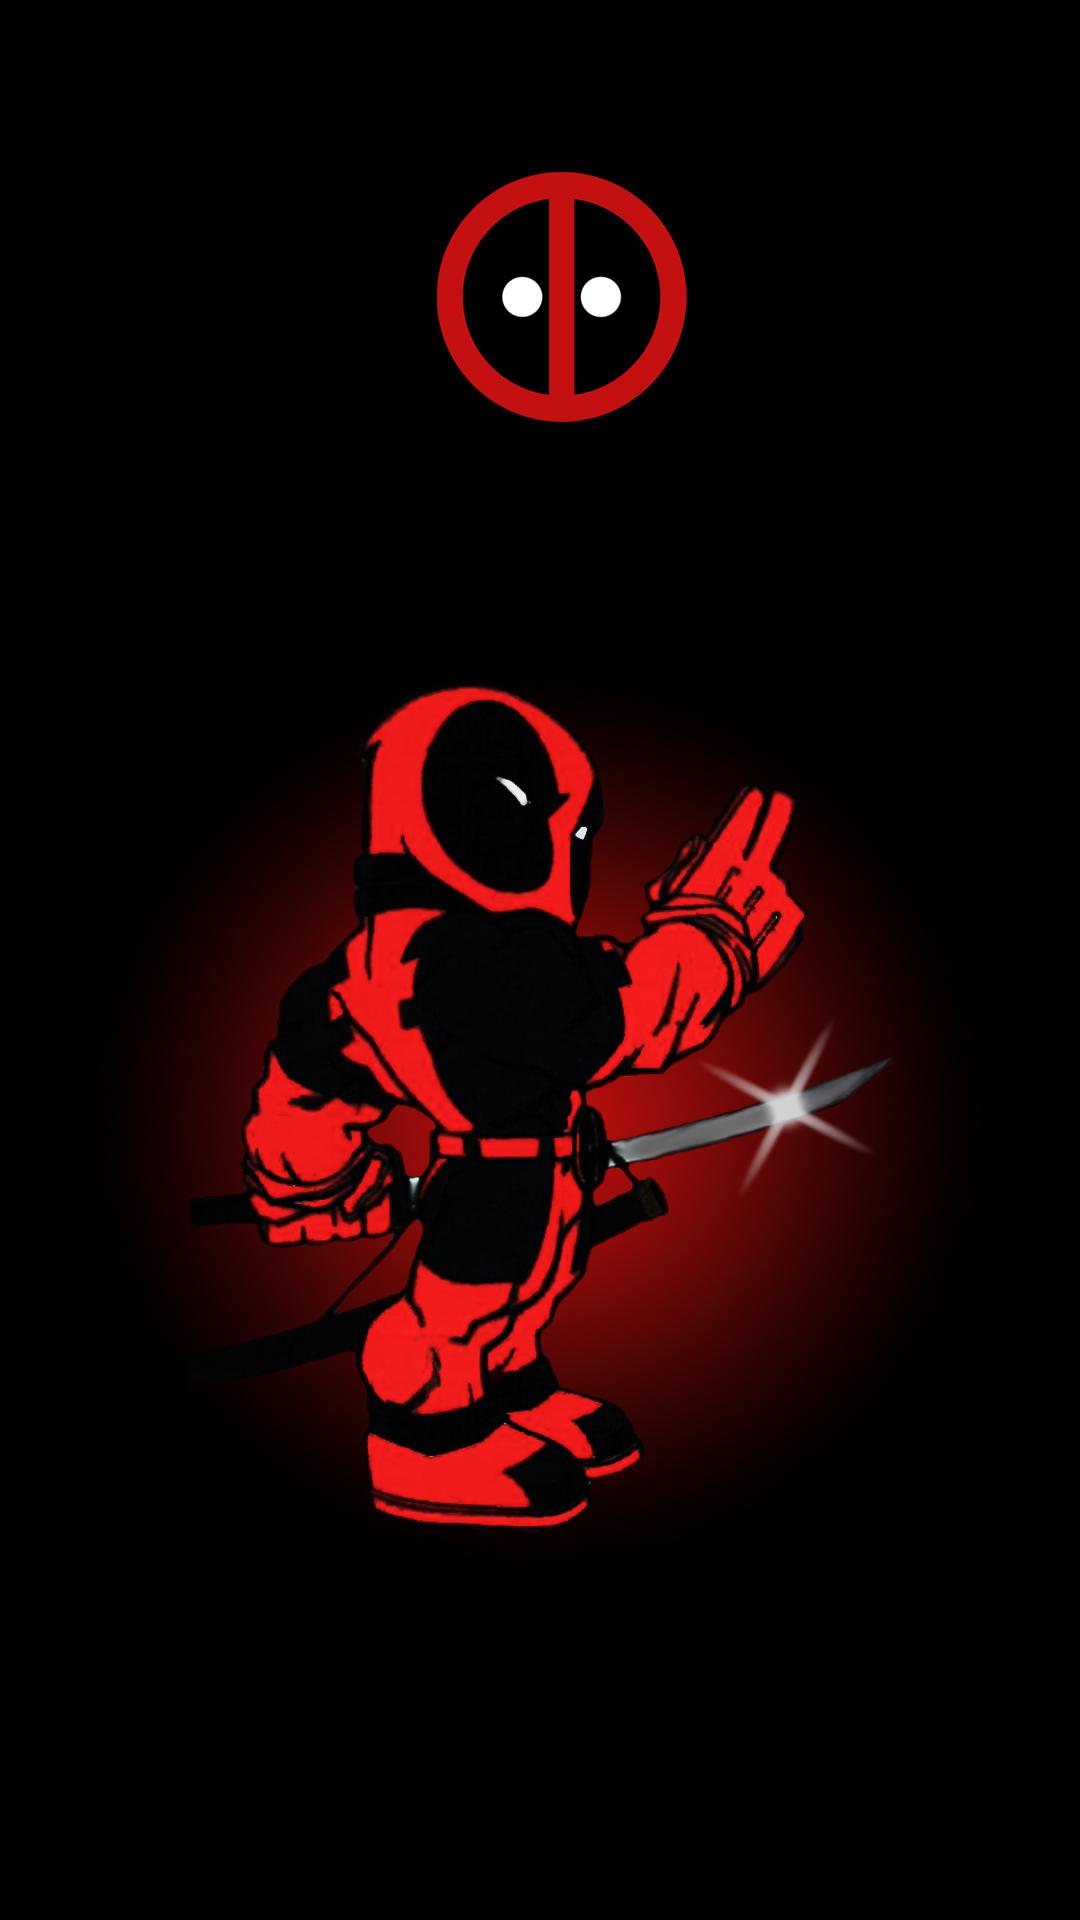 Deadpool wallpaper 1080p wallpapersafari - Marvel android wallpaper hd ...